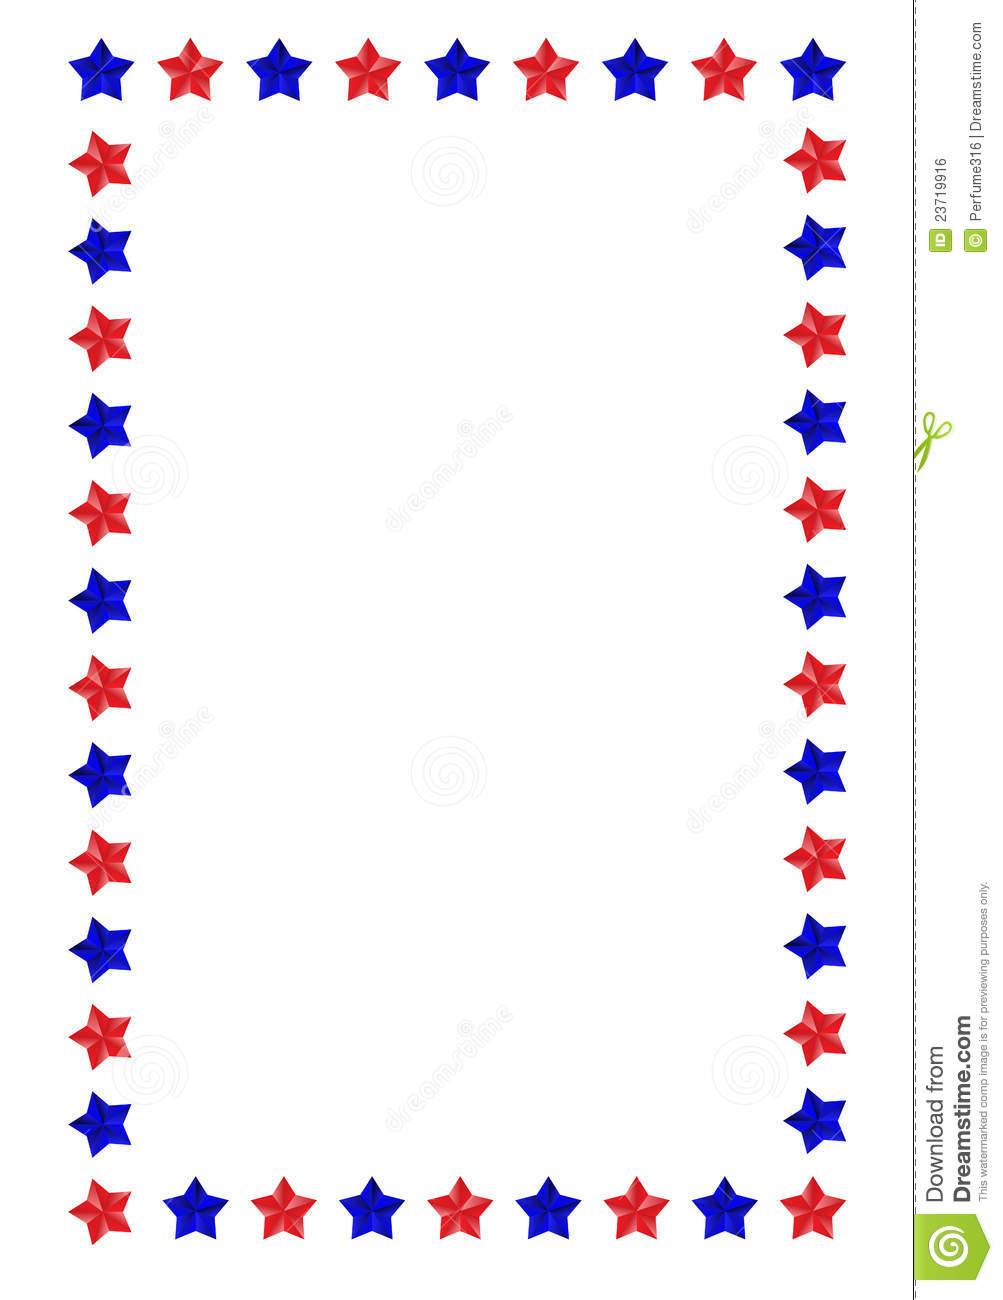 Illustrated u003cbu003eBorder - Star Border Clipart